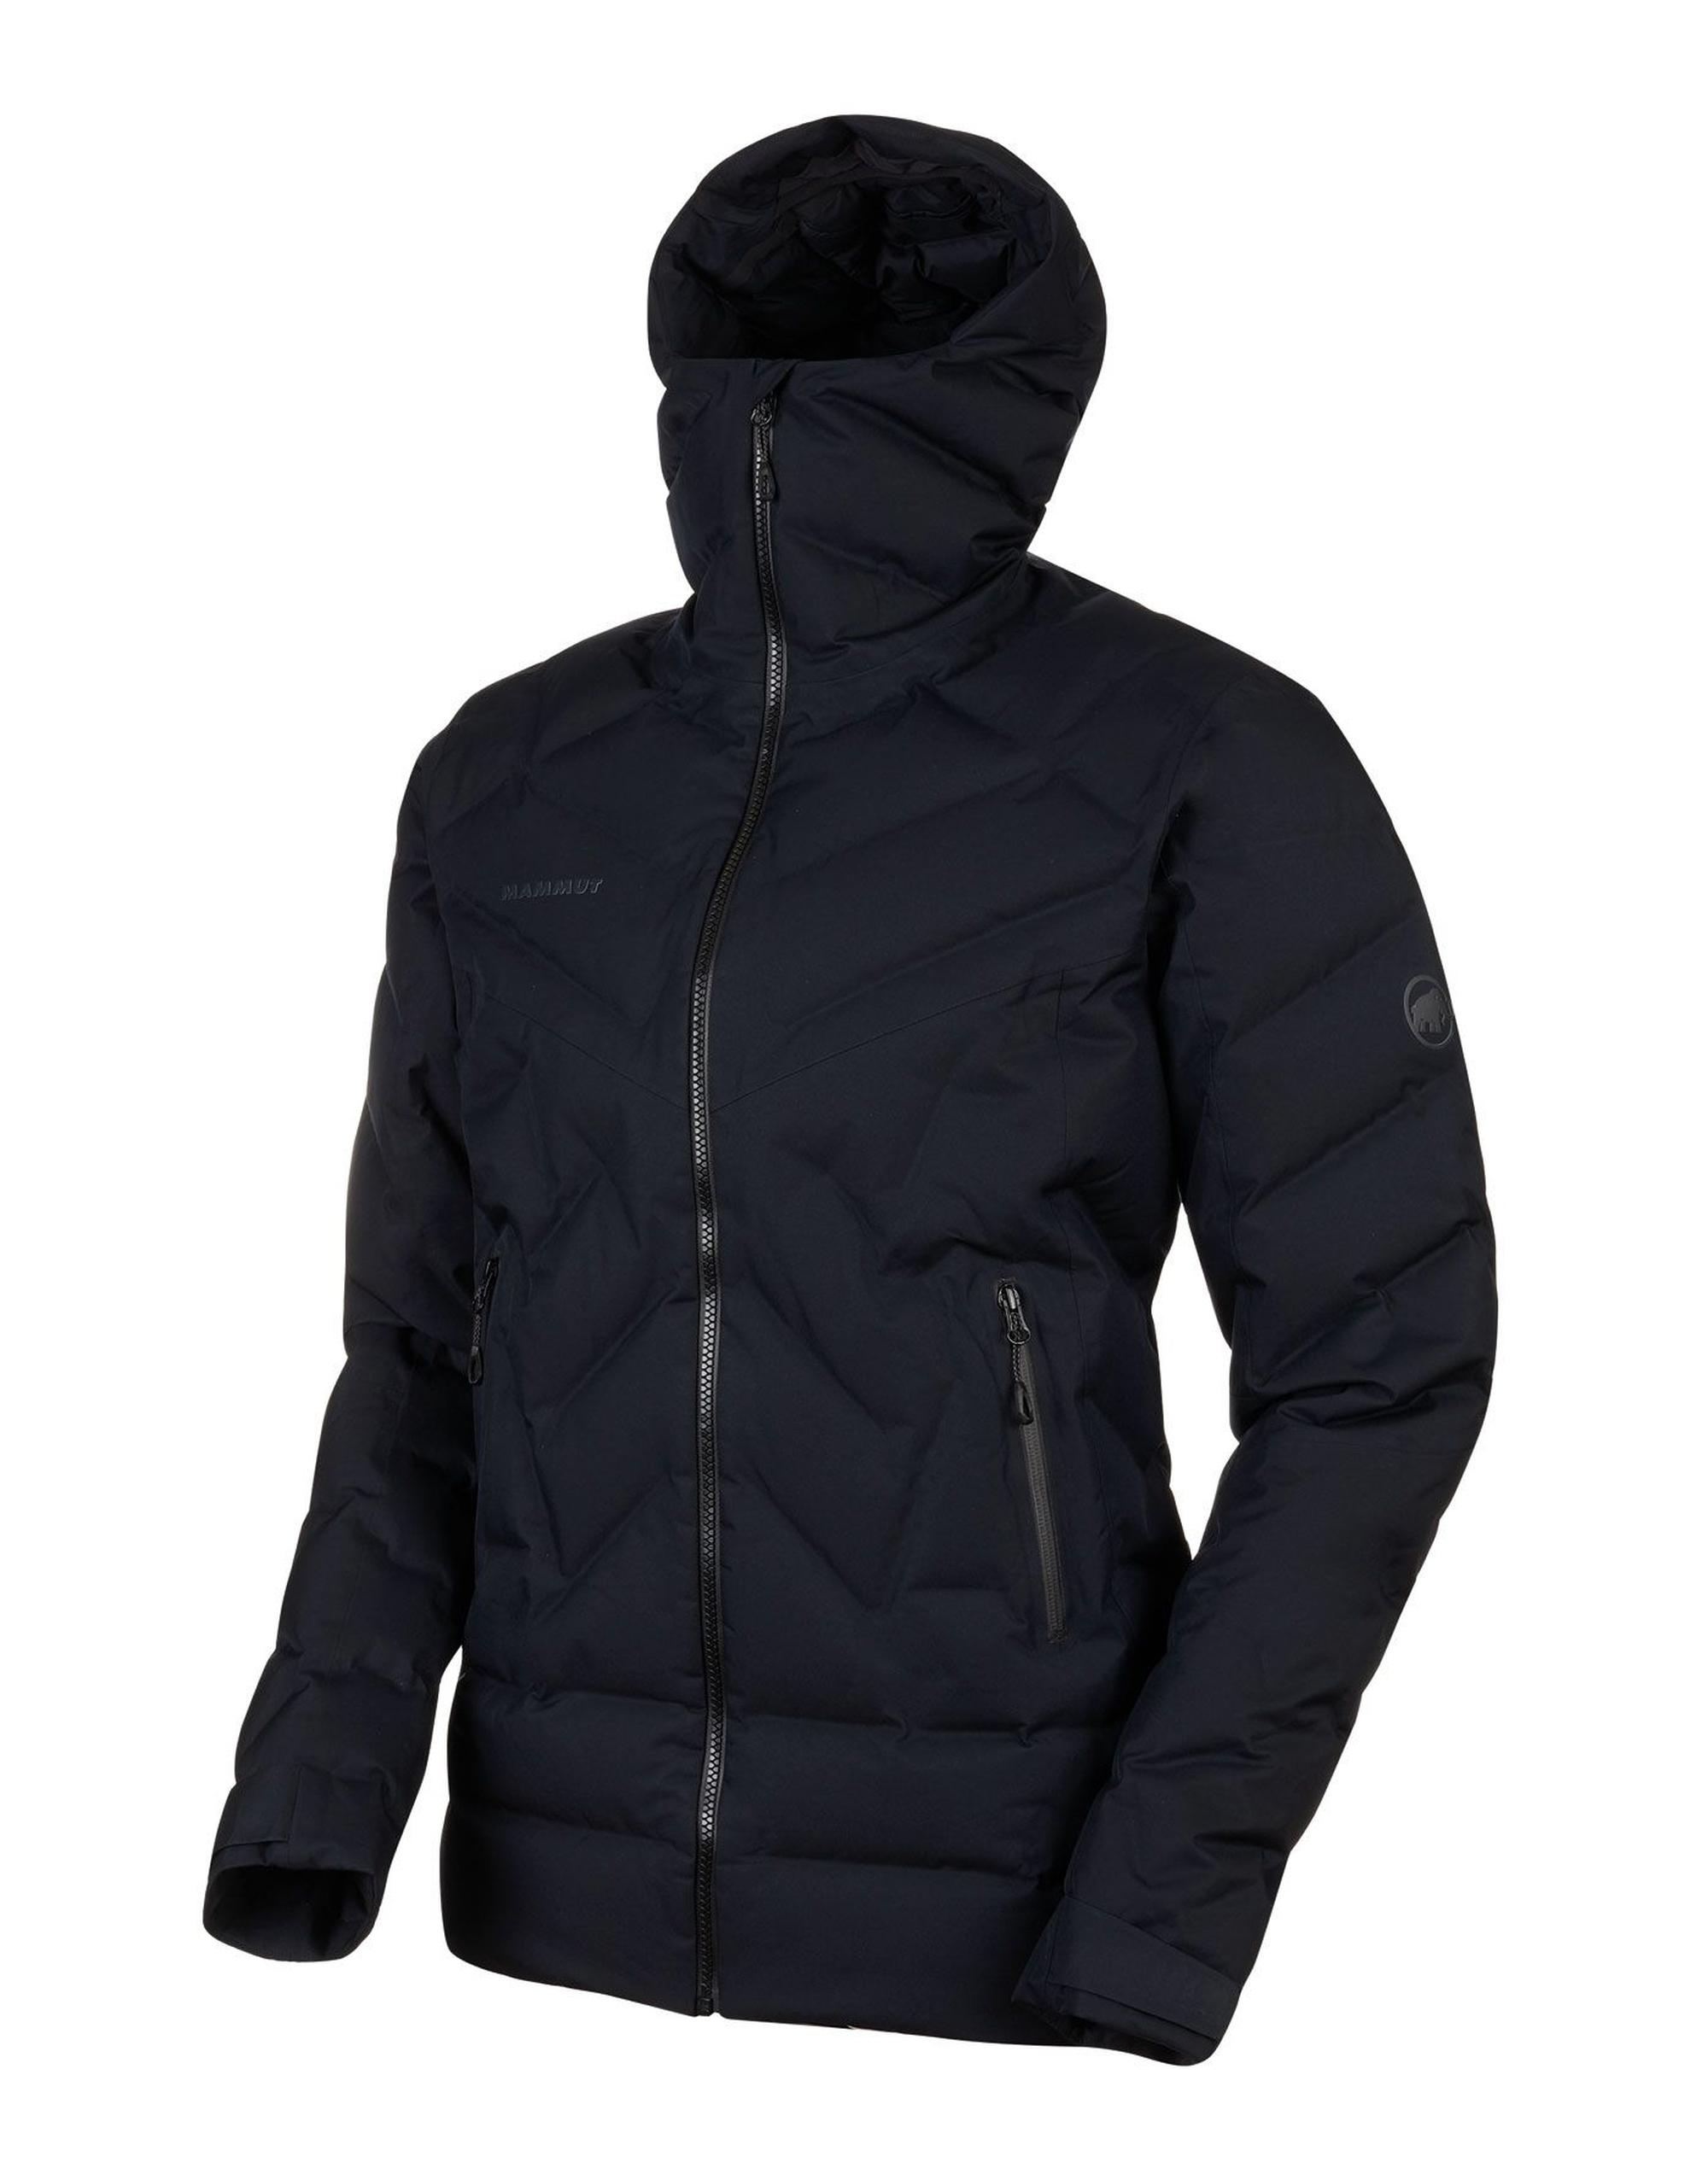 Mammut Photics Thermo Hooded Jacket